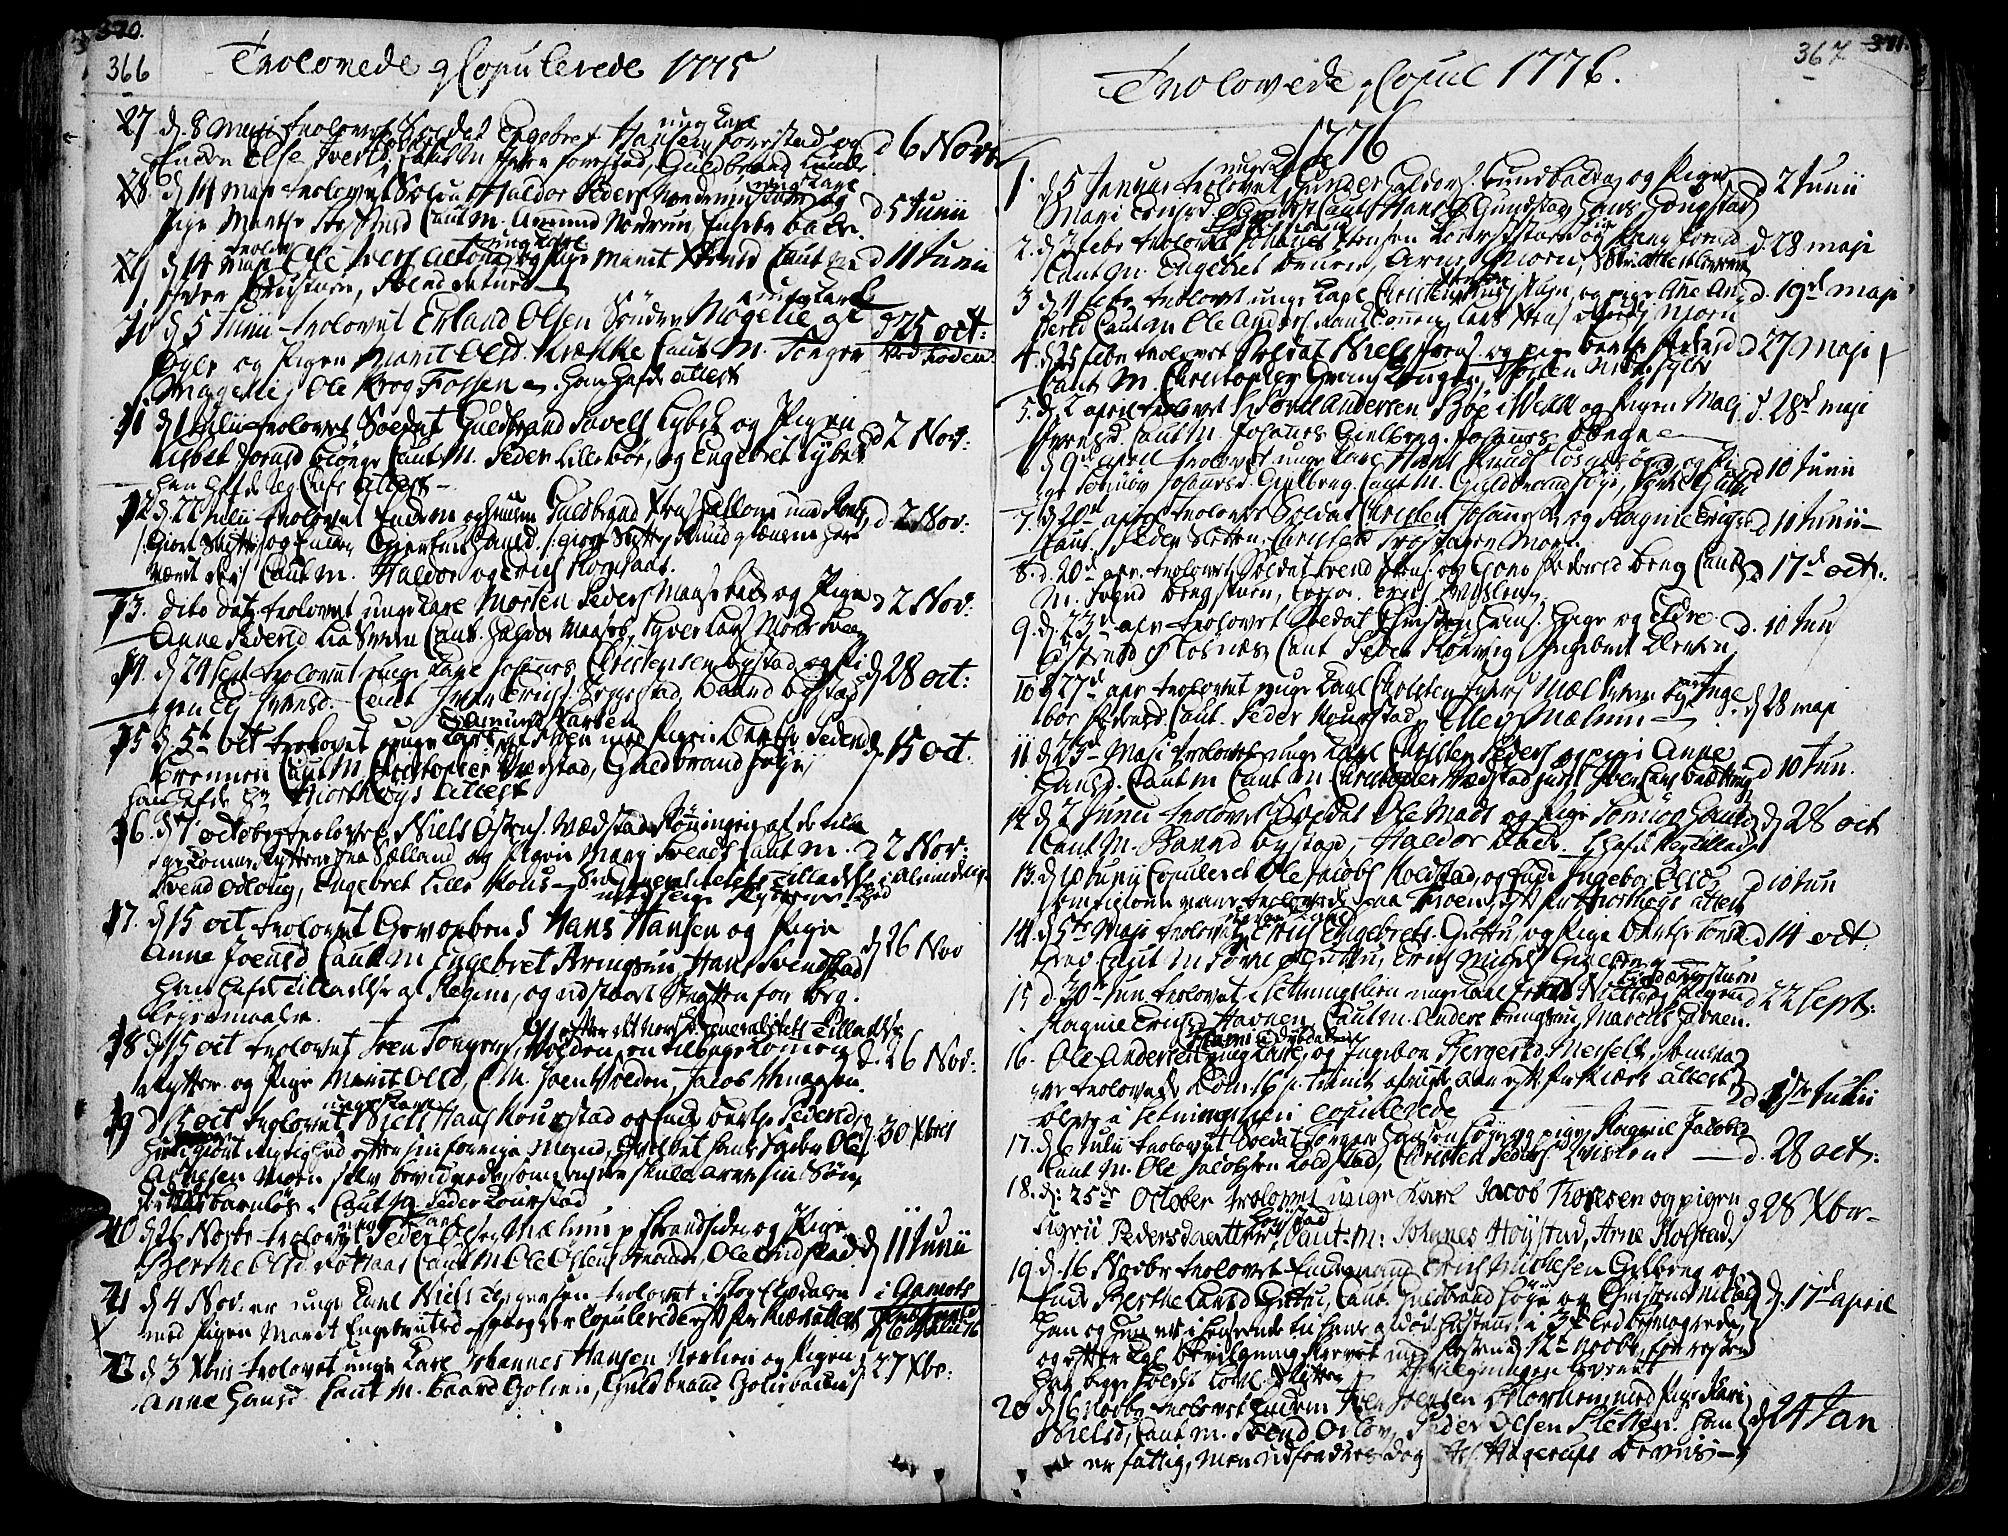 SAH, Ringebu prestekontor, Ministerialbok nr. 2, 1734-1780, s. 366-367